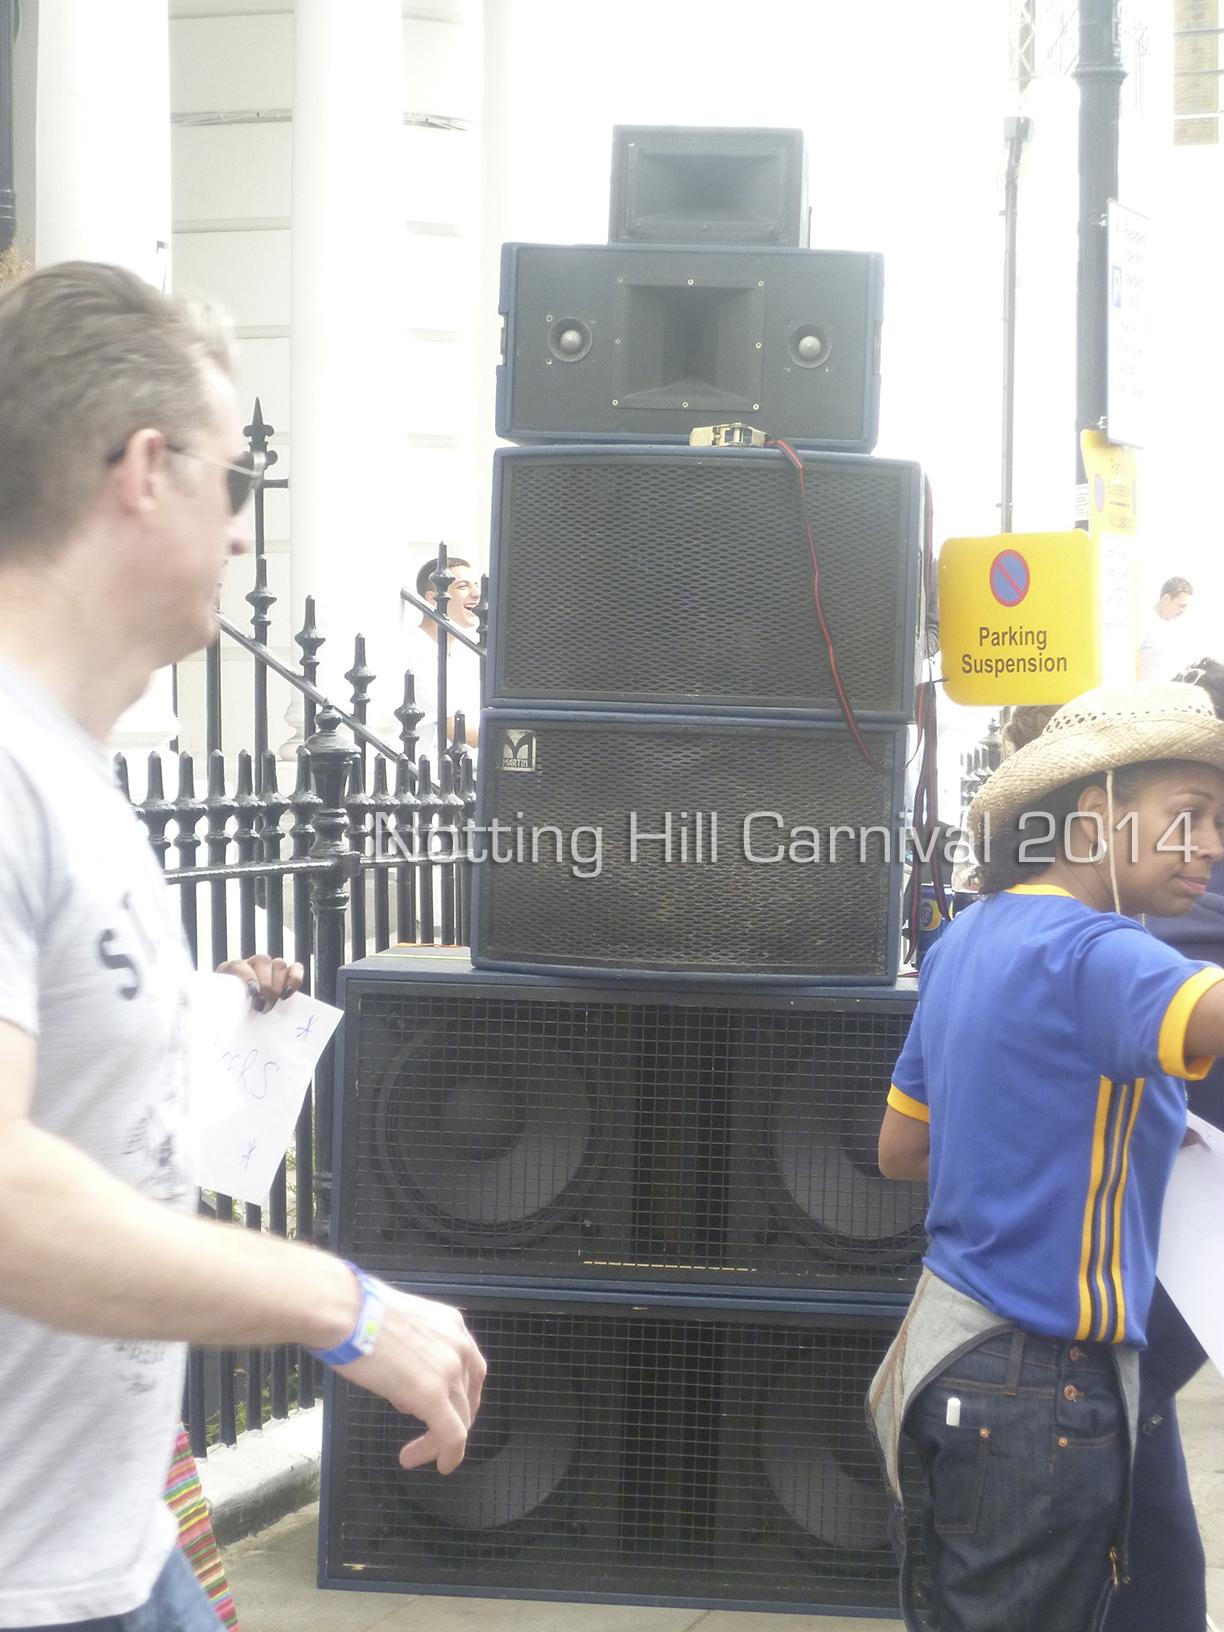 Notting-Hill-Carnival-2014-Street-Sound-System-7